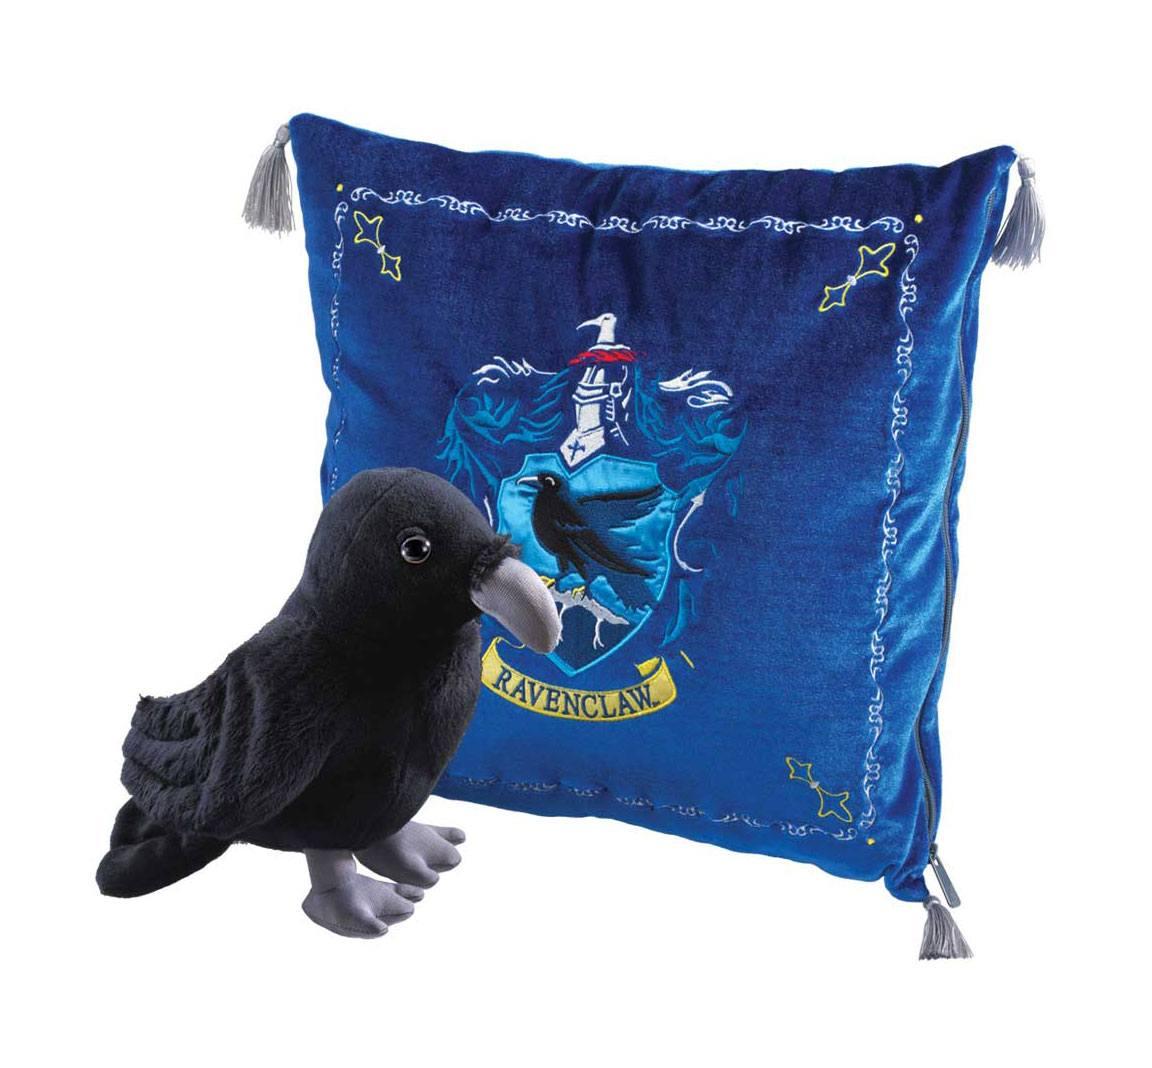 Harry Potter House Mascot Cushion with Plush Figure Ravenclaw